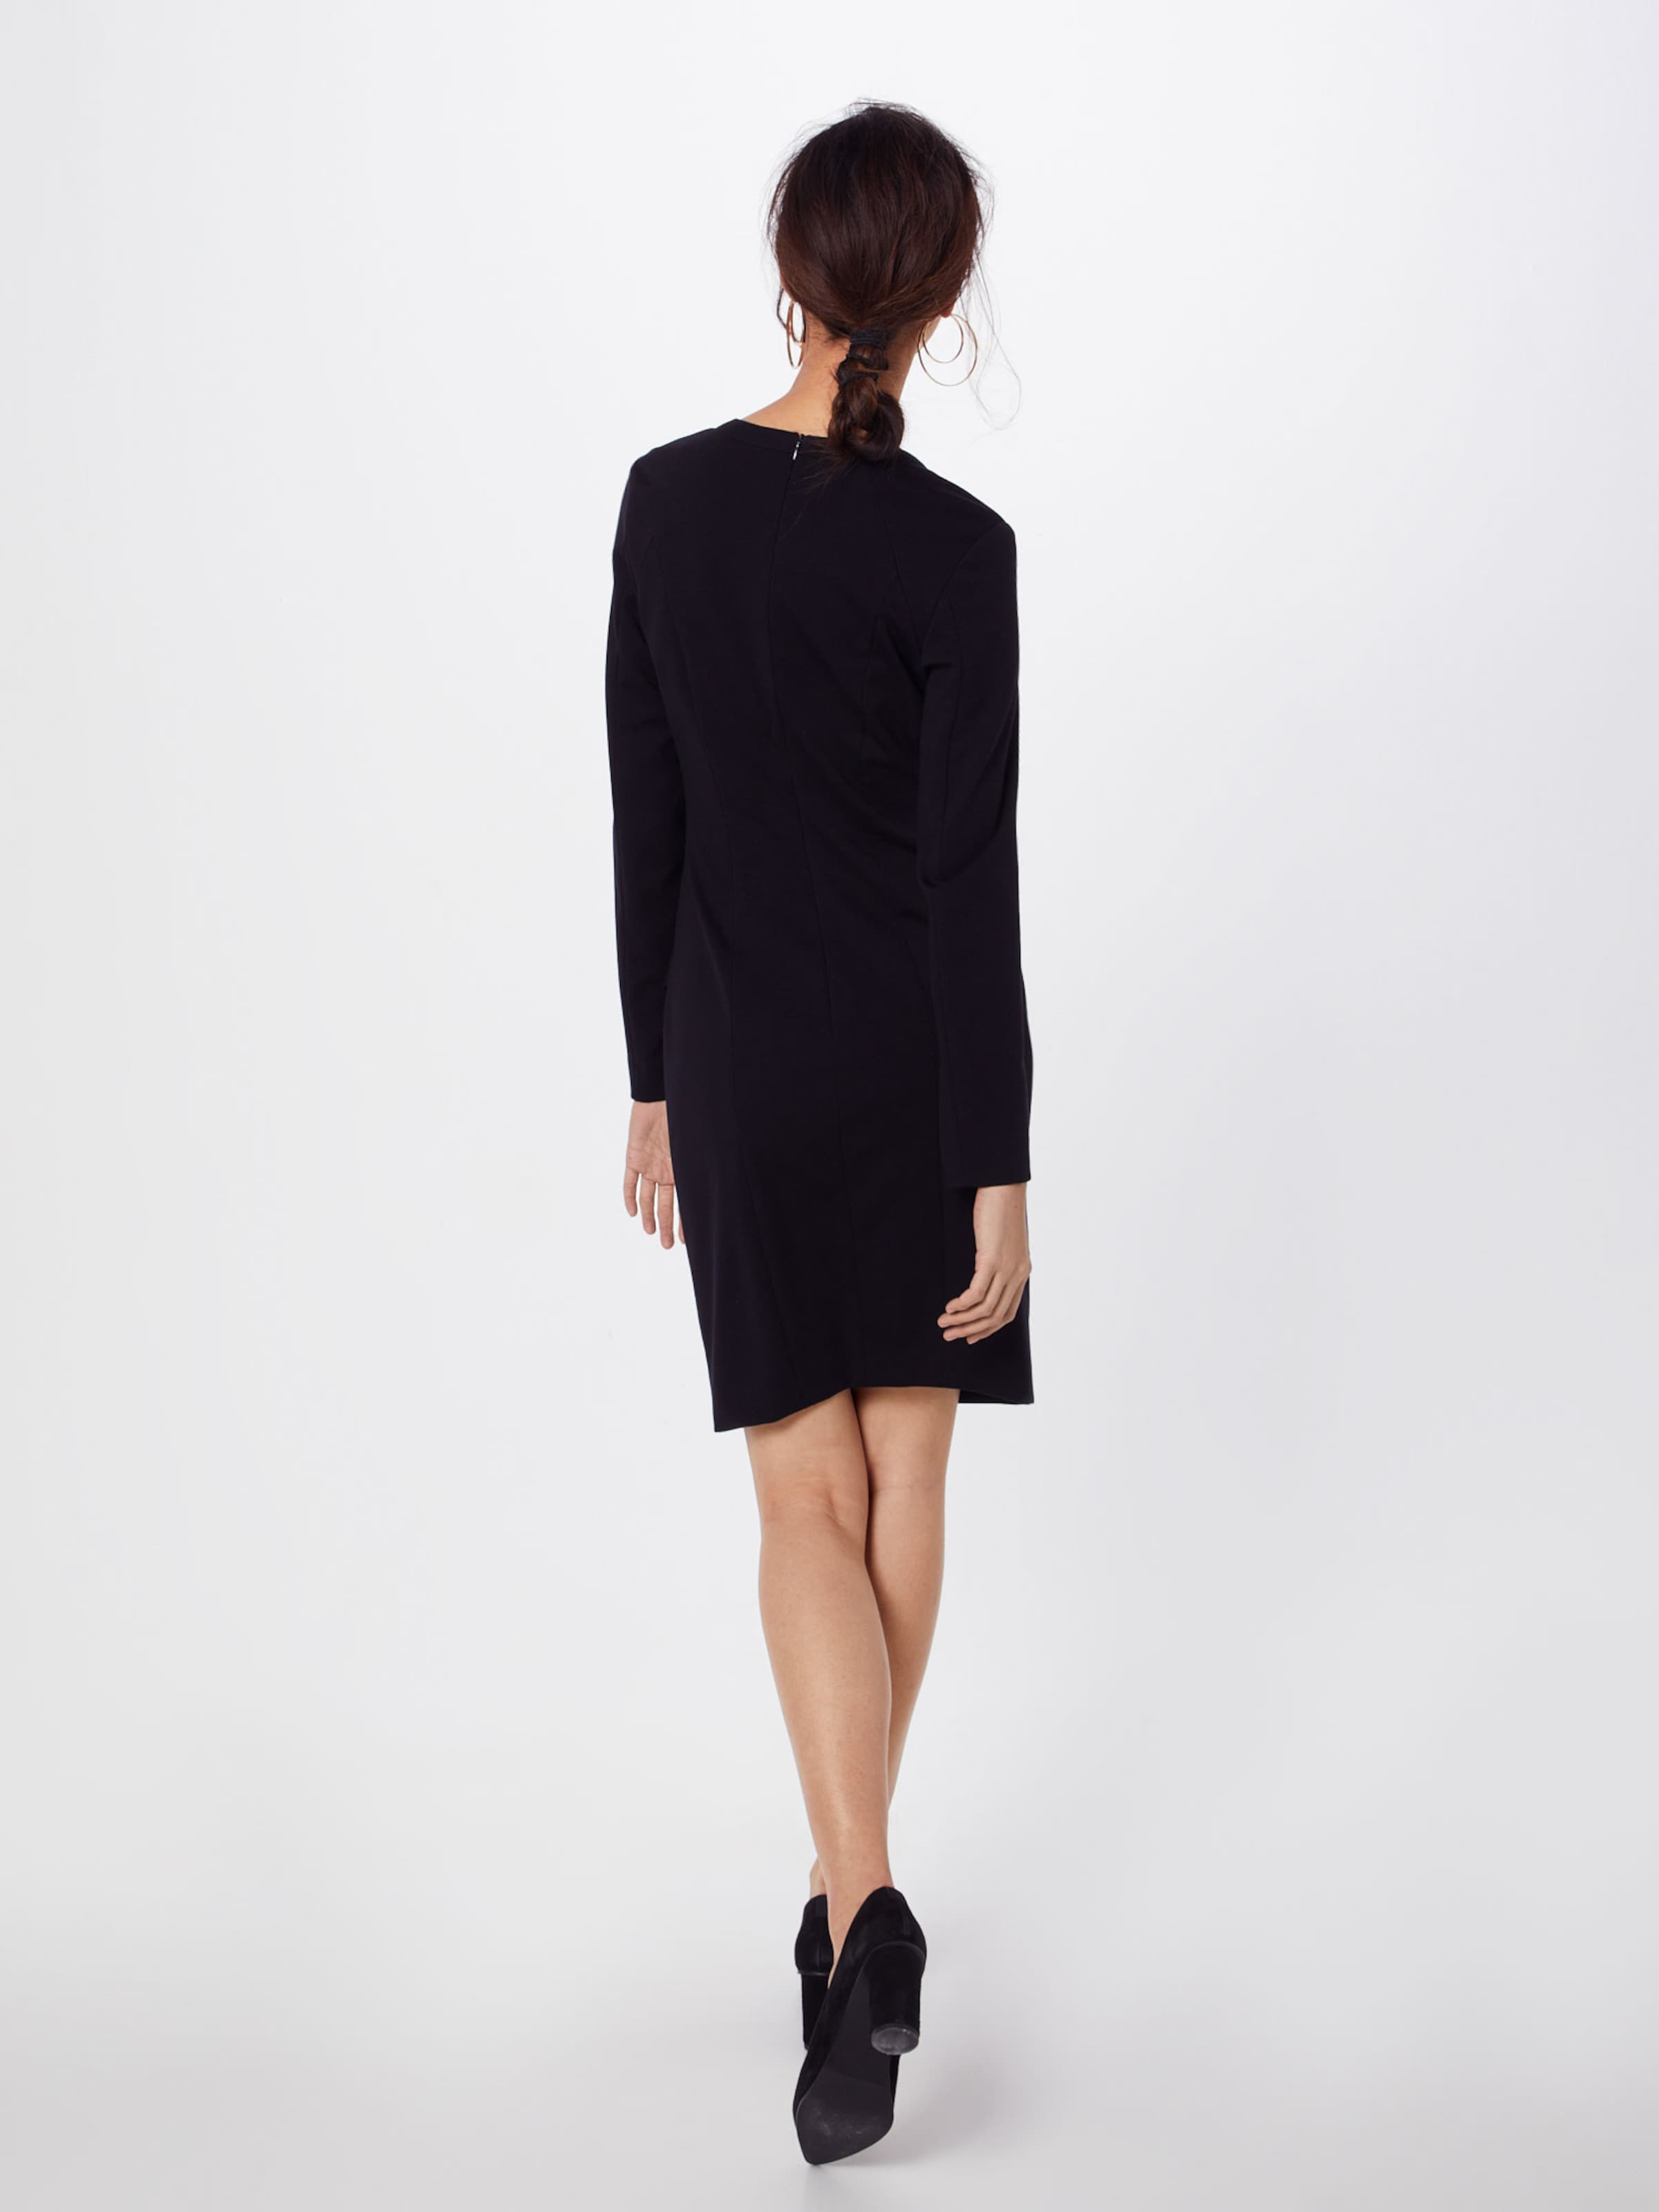 En René 'e056a' Lezard Robe Noir A4L35Rjq